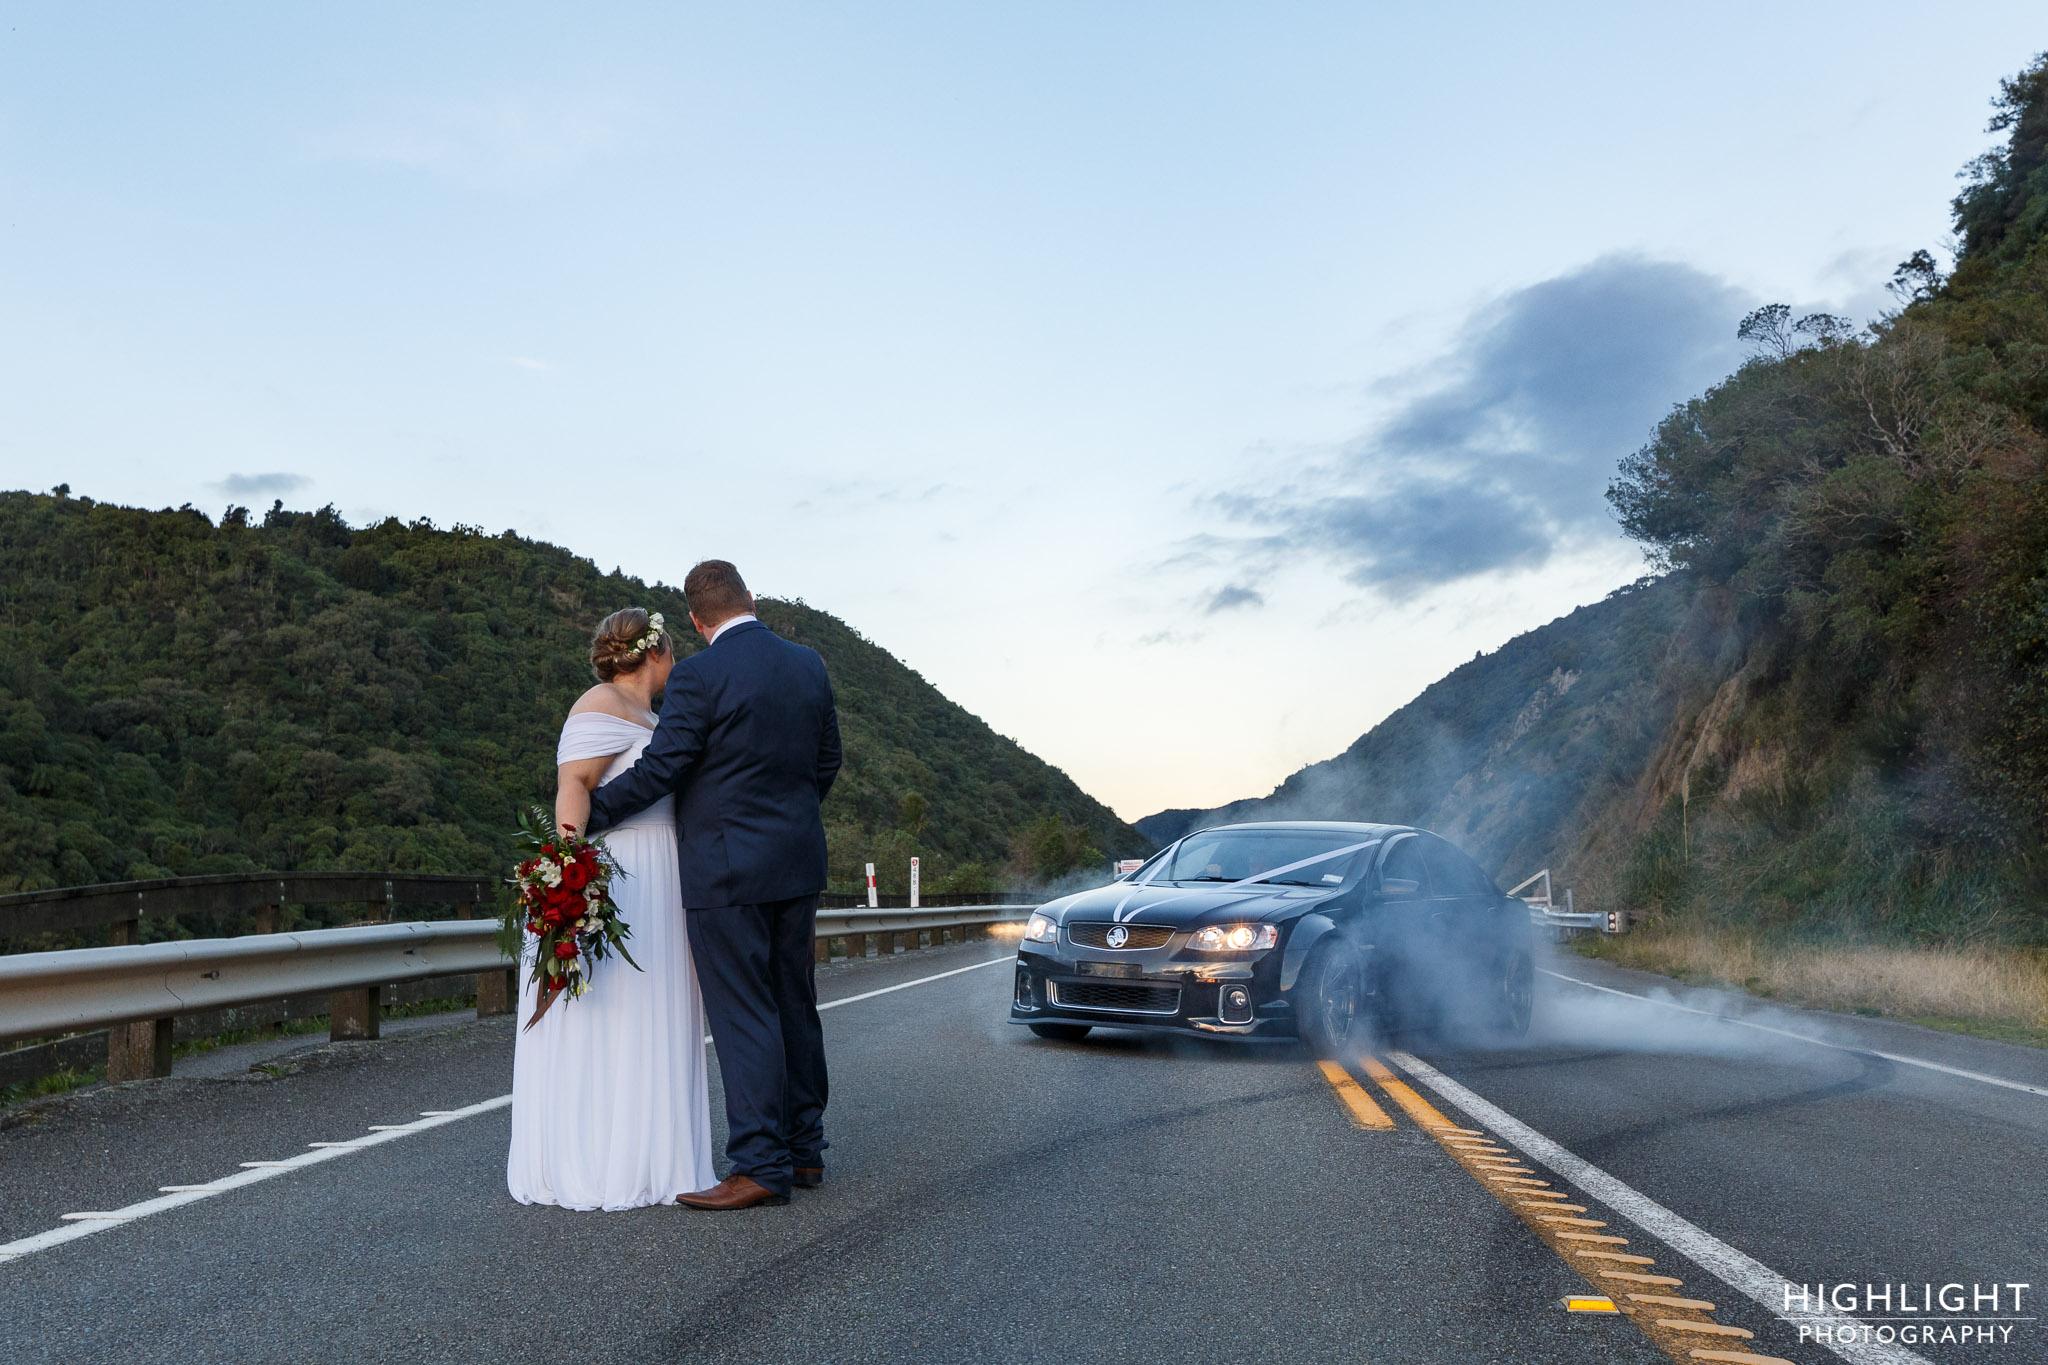 Highlight-wedding-photography-new-zealand-palmerston-north-101.jpg